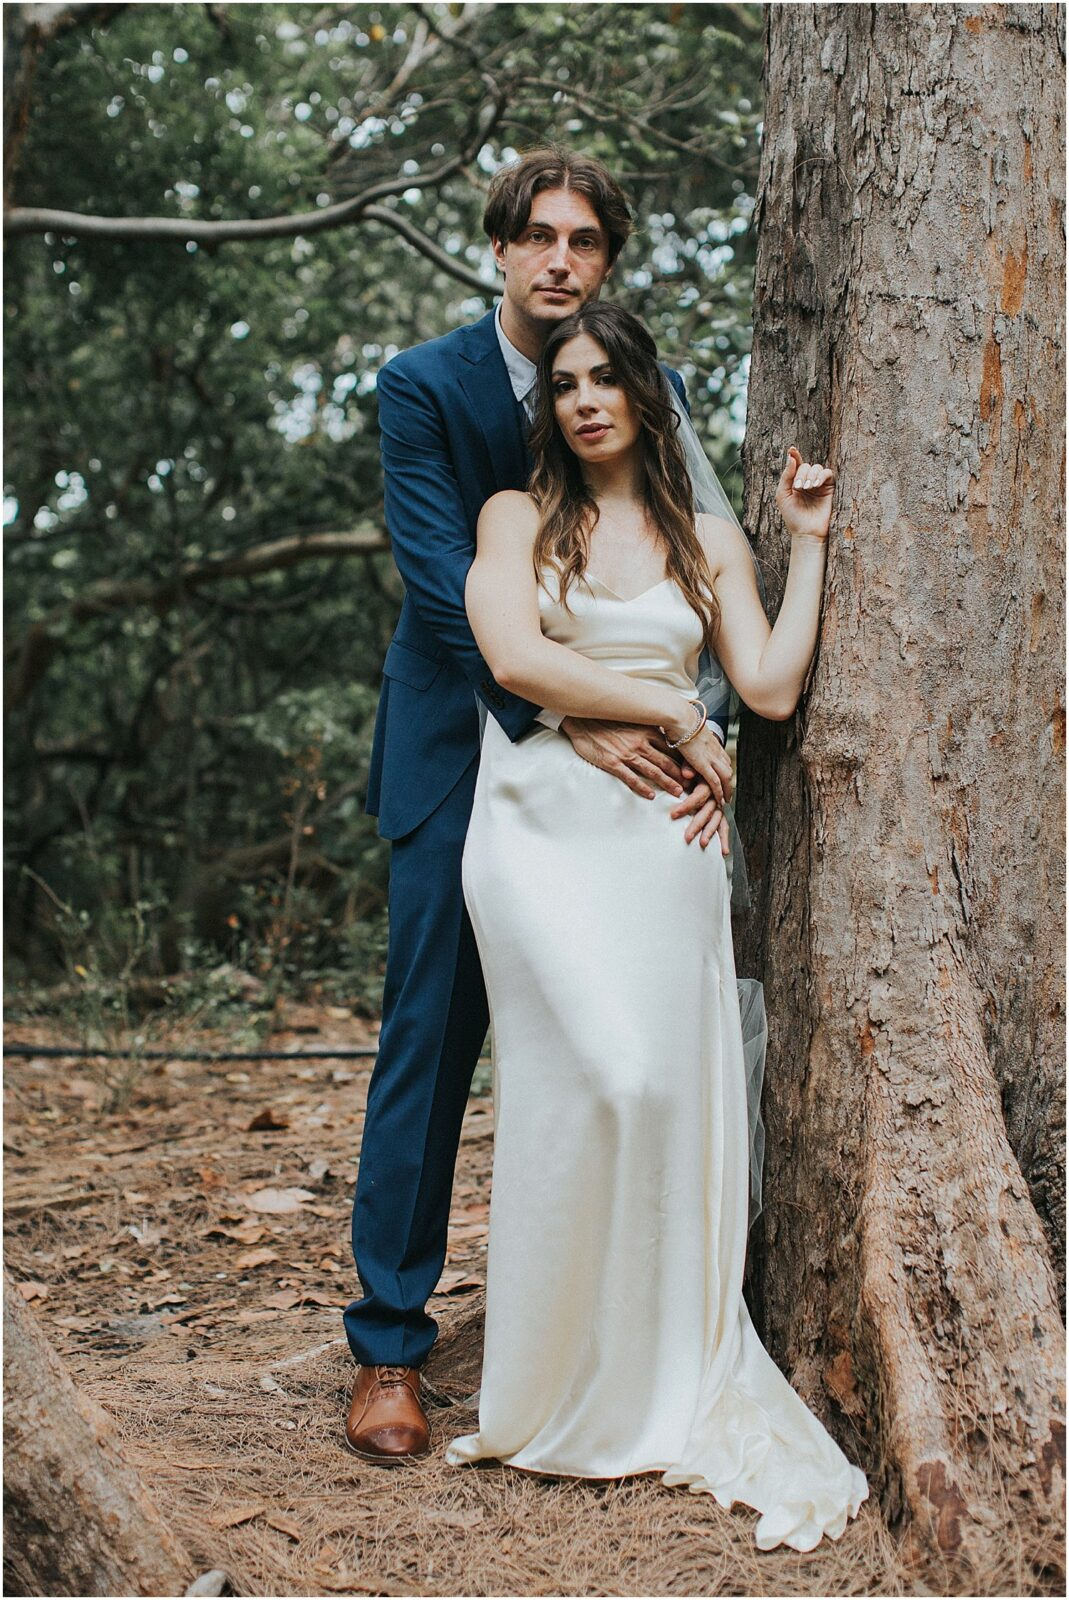 editorial bride and groom portraits